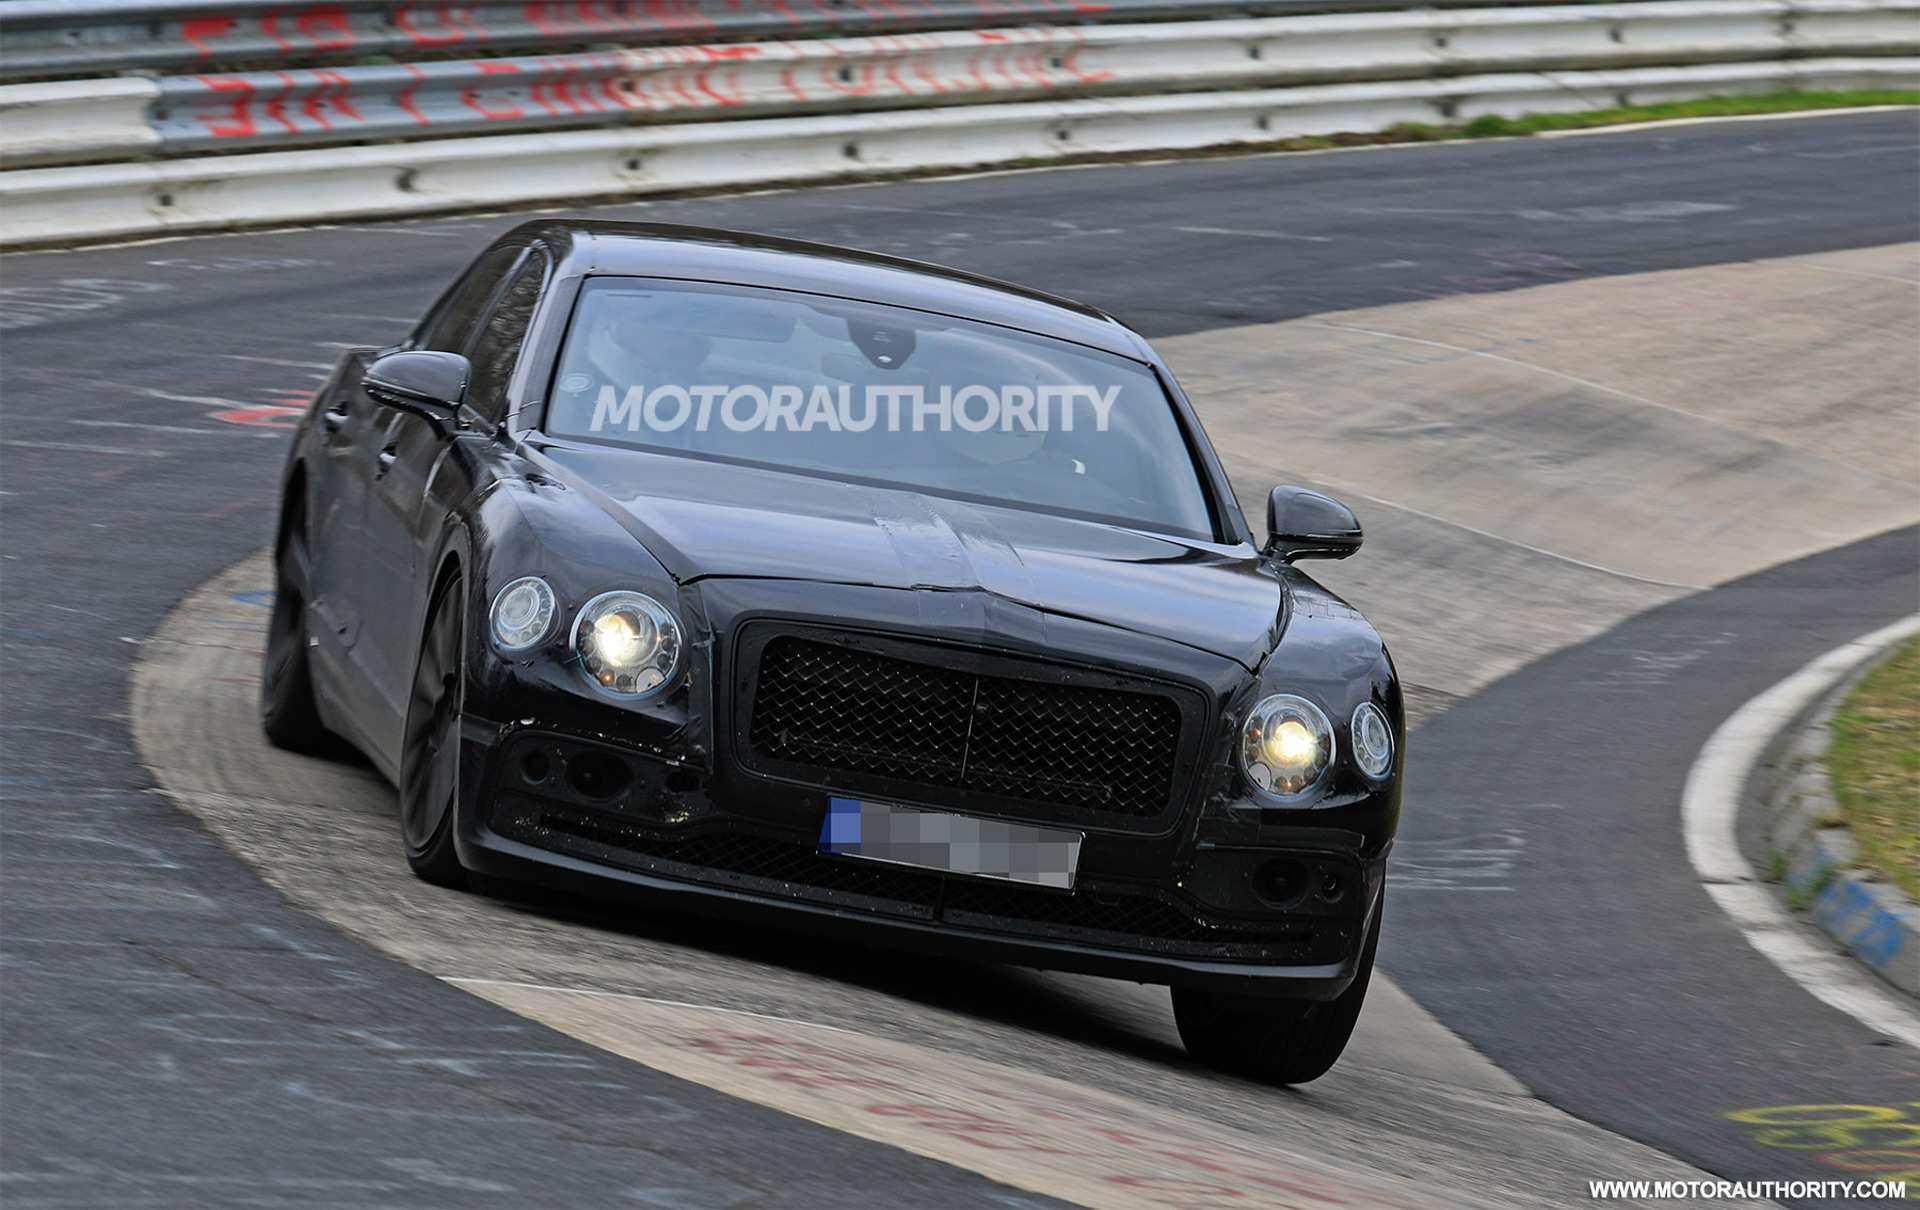 82 Best Review Bentley Neuheiten 2020 Photos with Bentley Neuheiten 2020